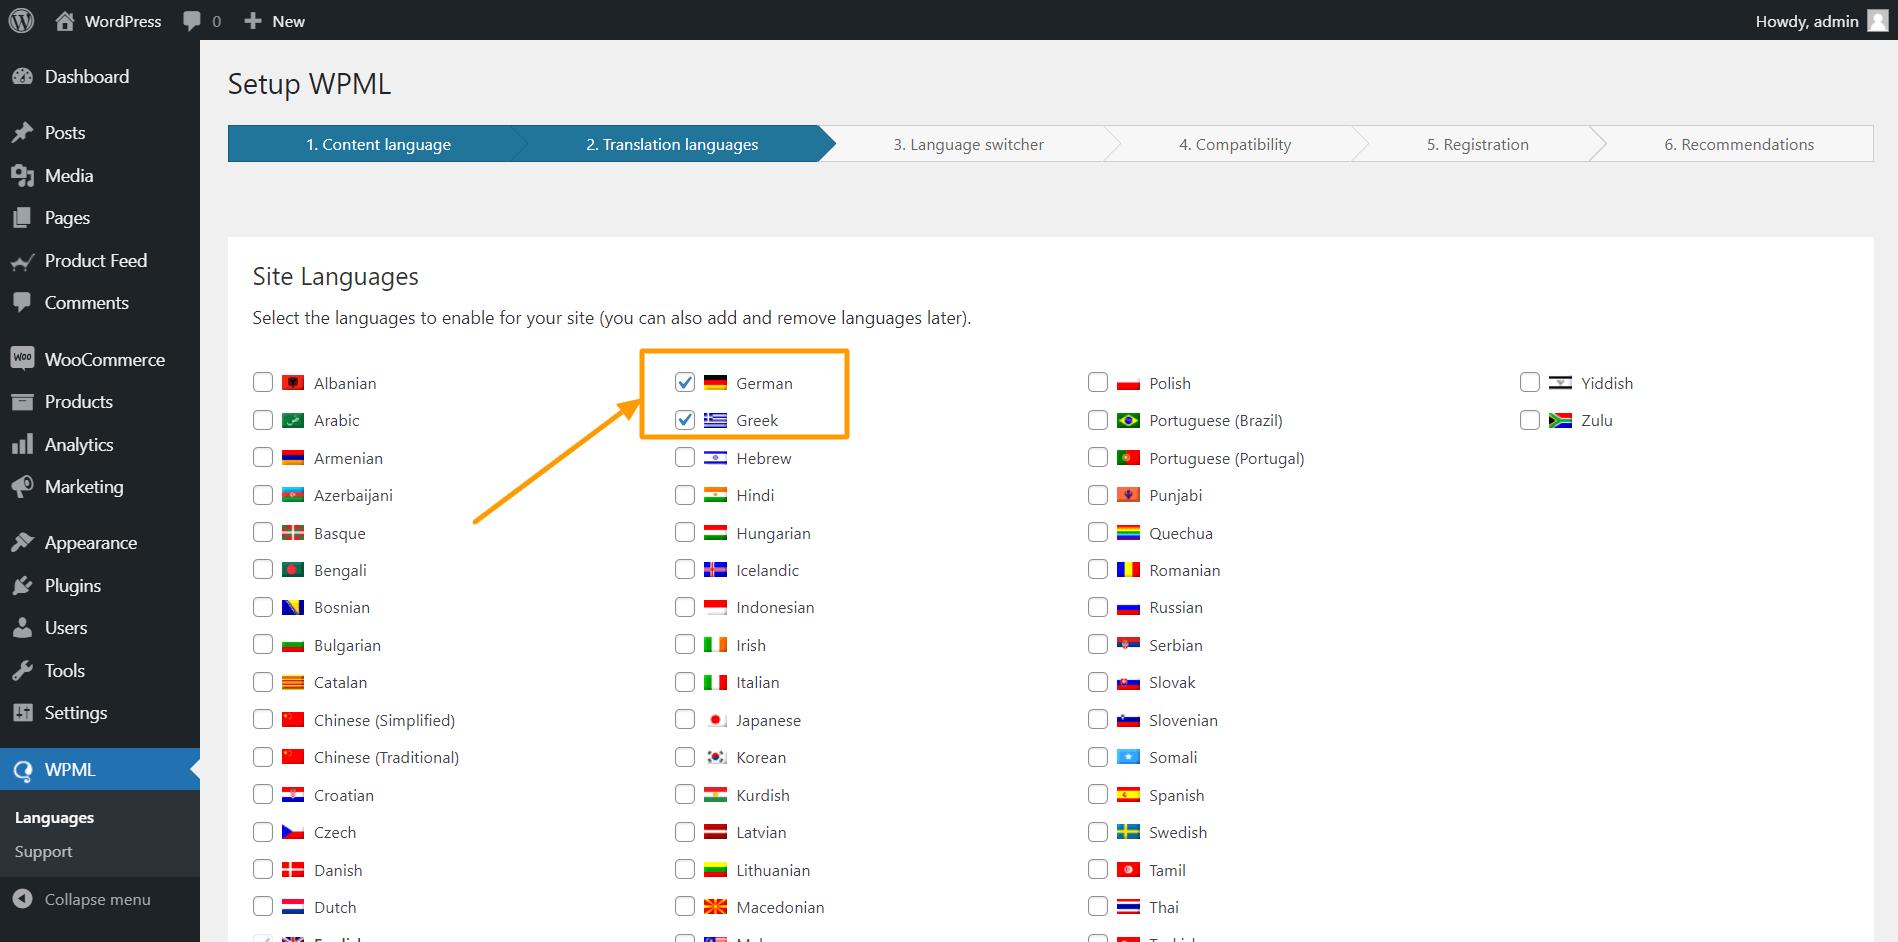 WPML Translation Languages